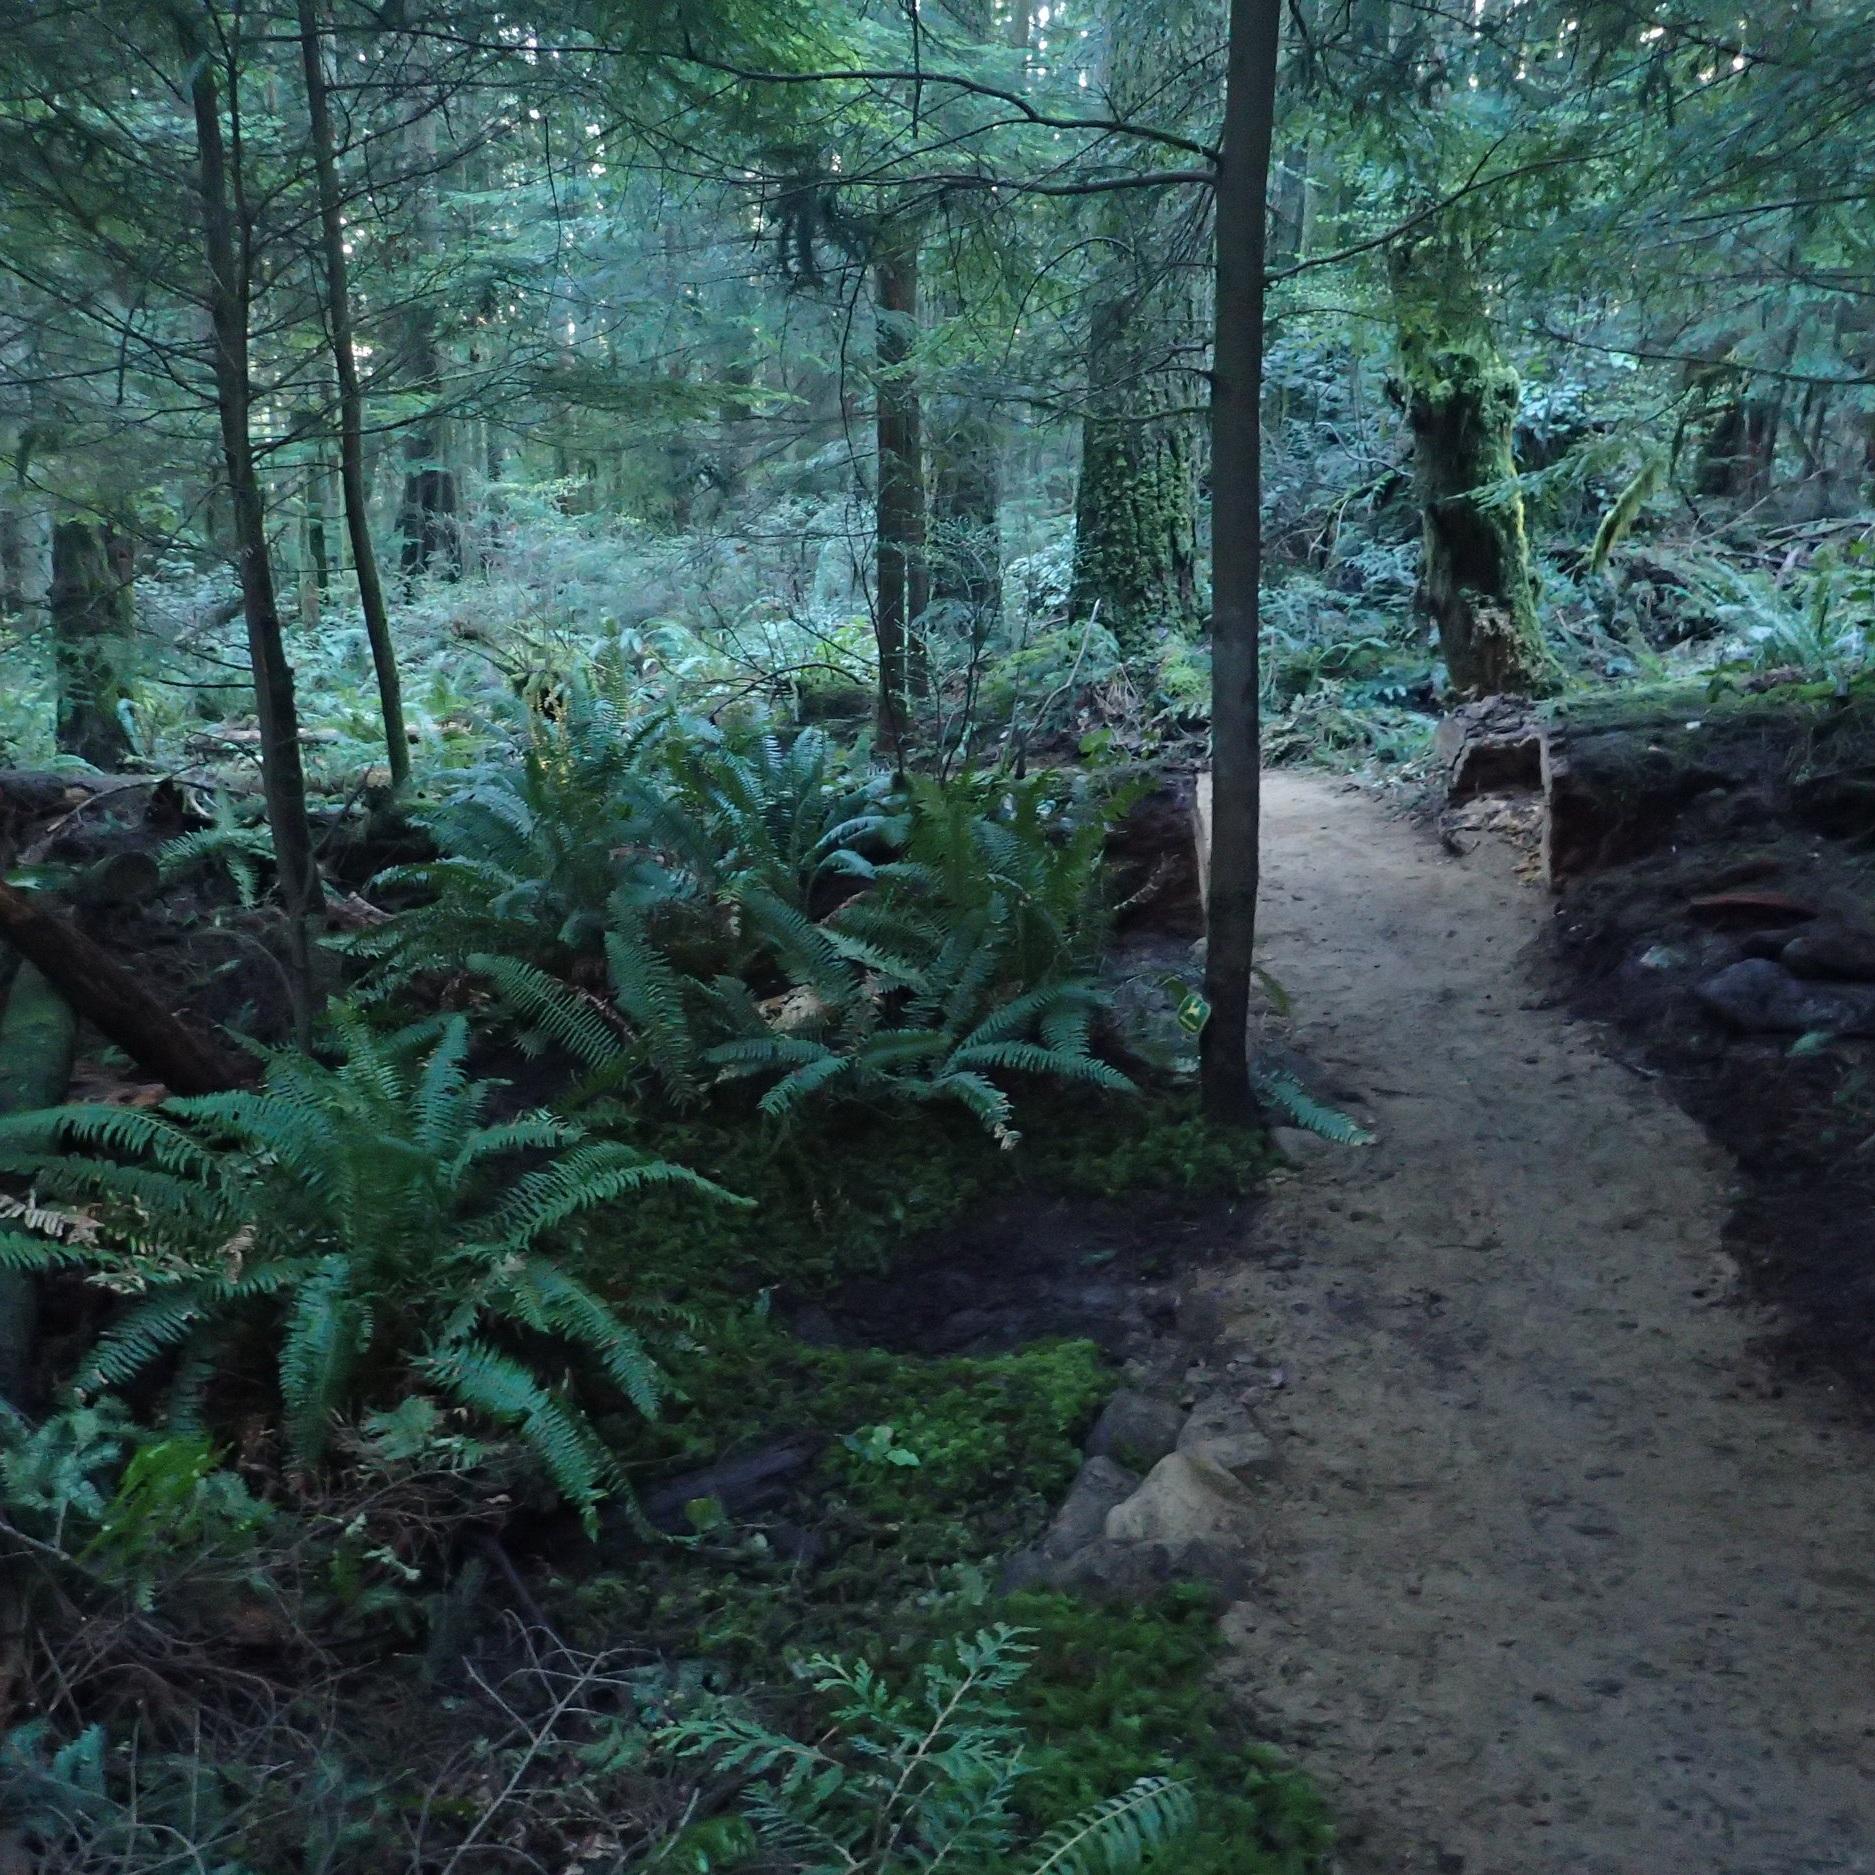 John Deer - With Drainage